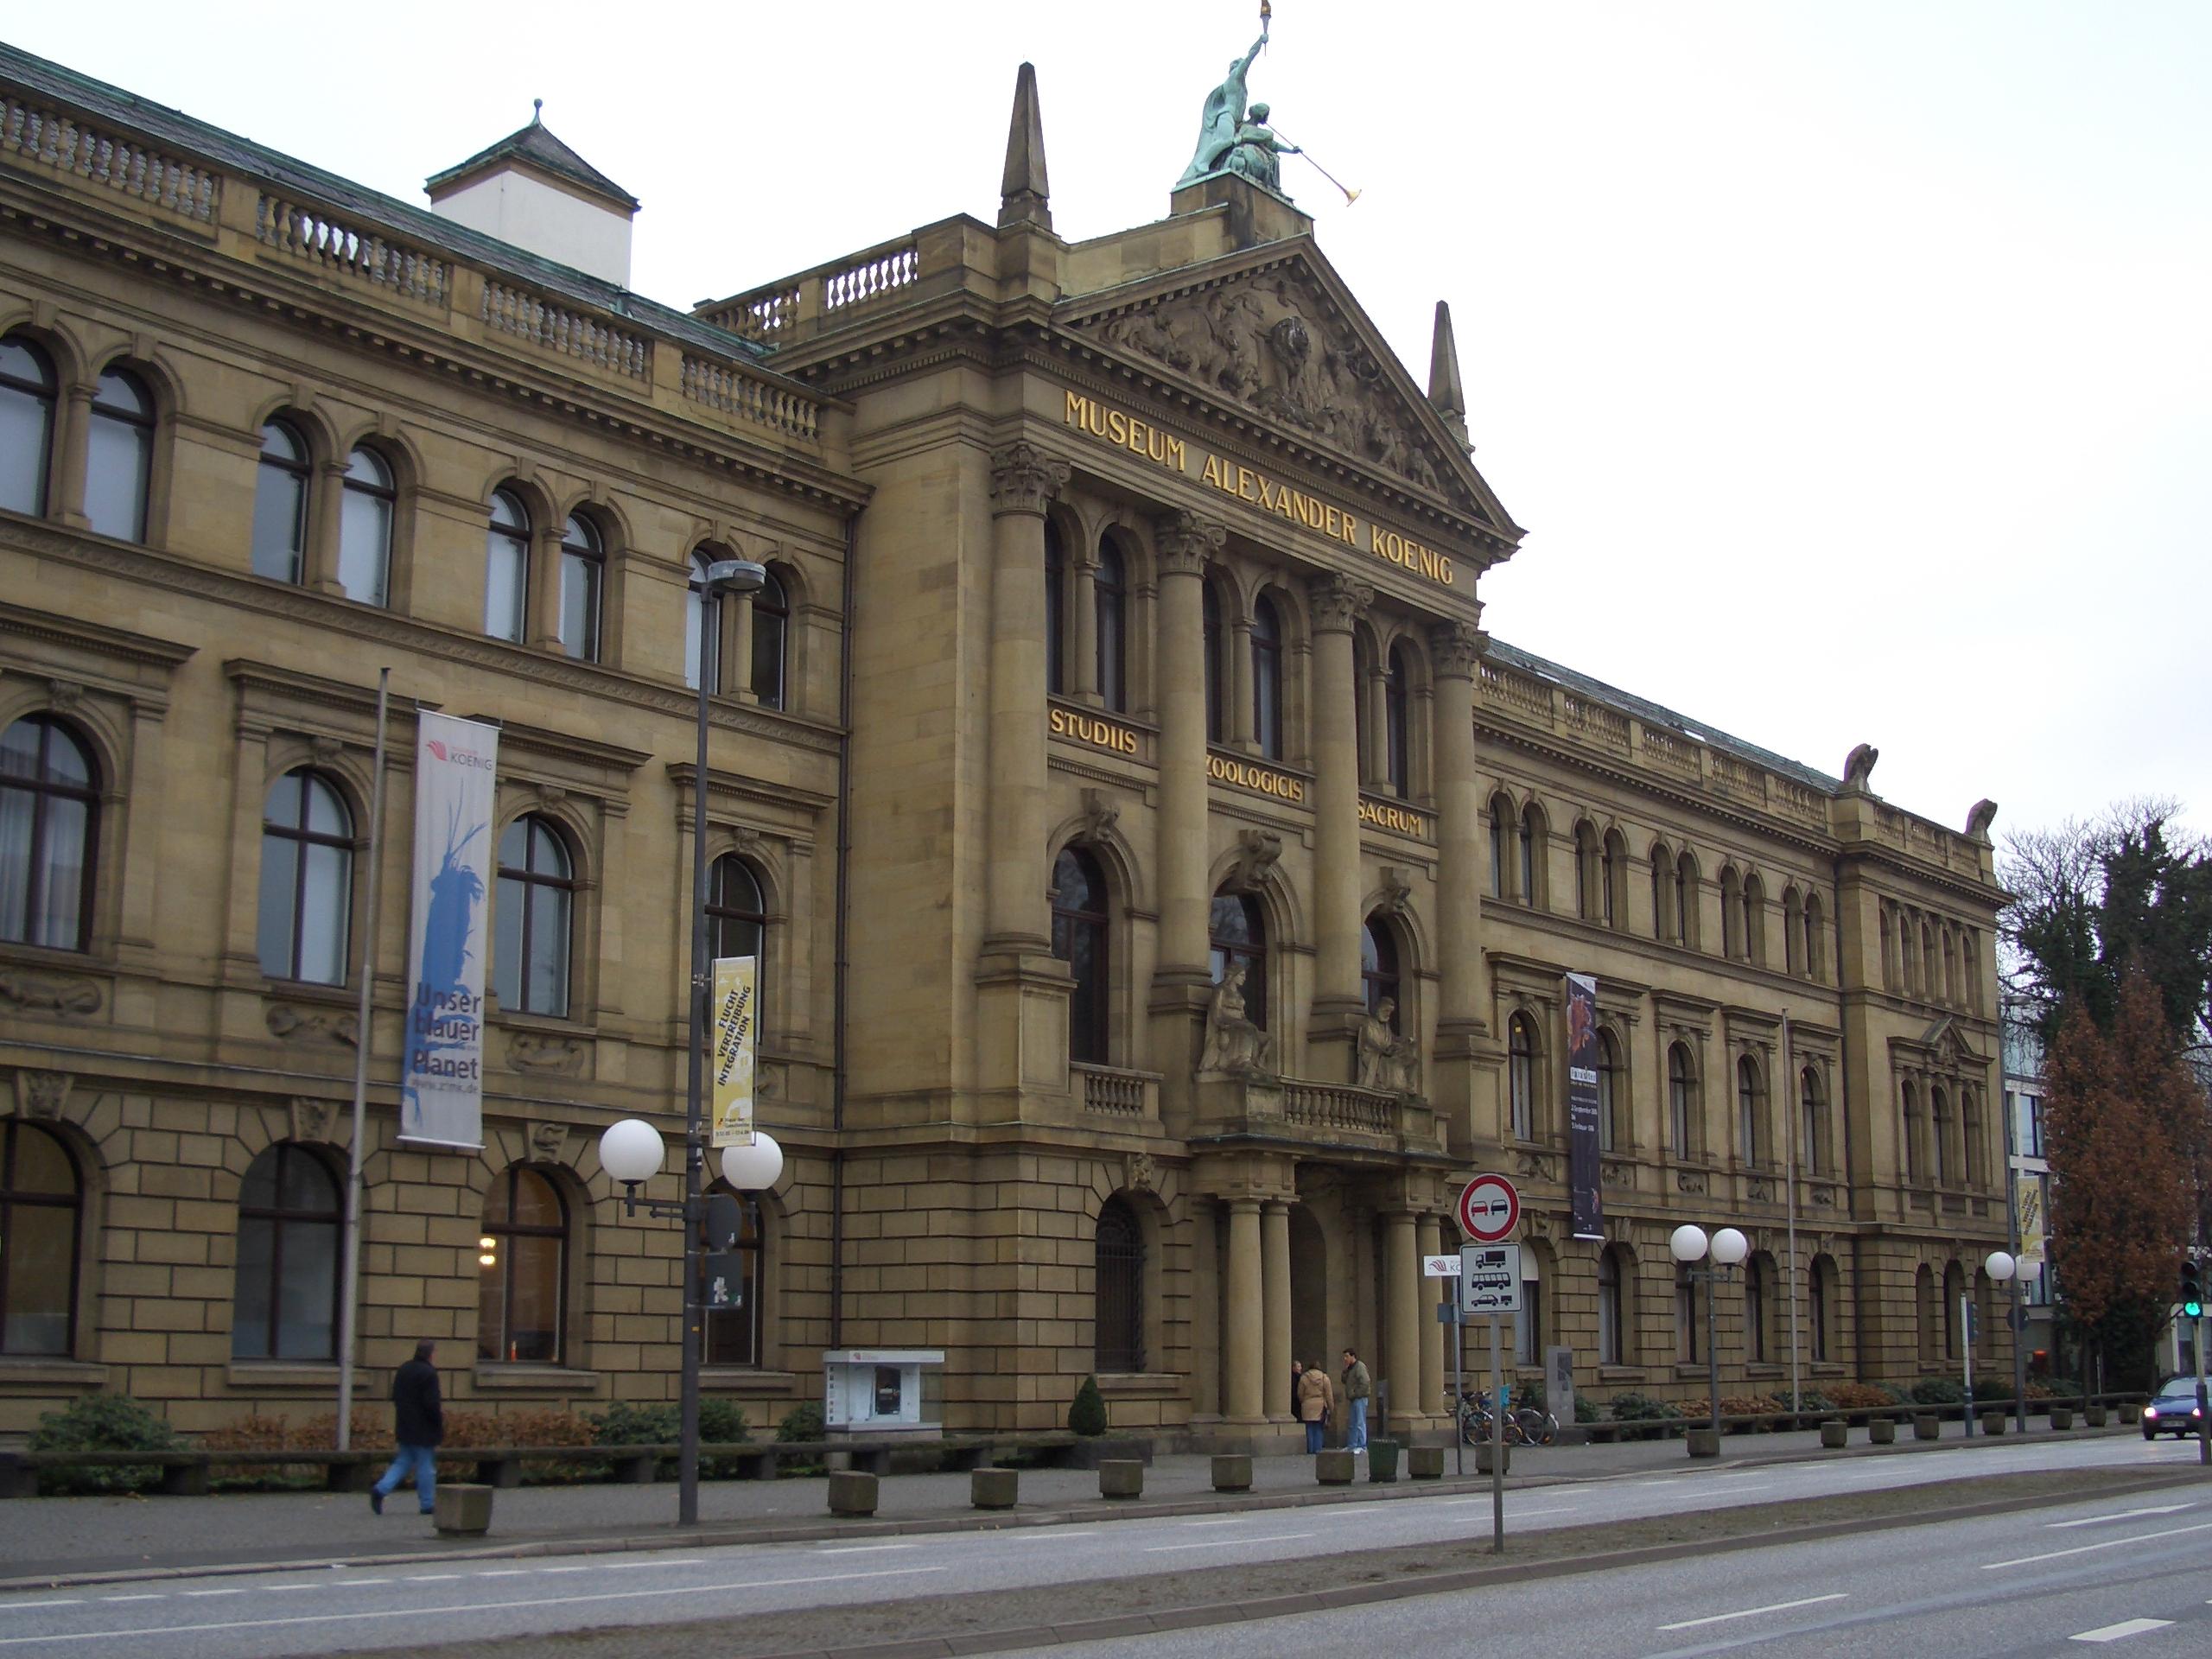 https://i1.wp.com/upload.wikimedia.org/wikipedia/commons/8/89/Au%C3%9Fenfassade_des_Museums_Koenig_in_Bonn.jpg